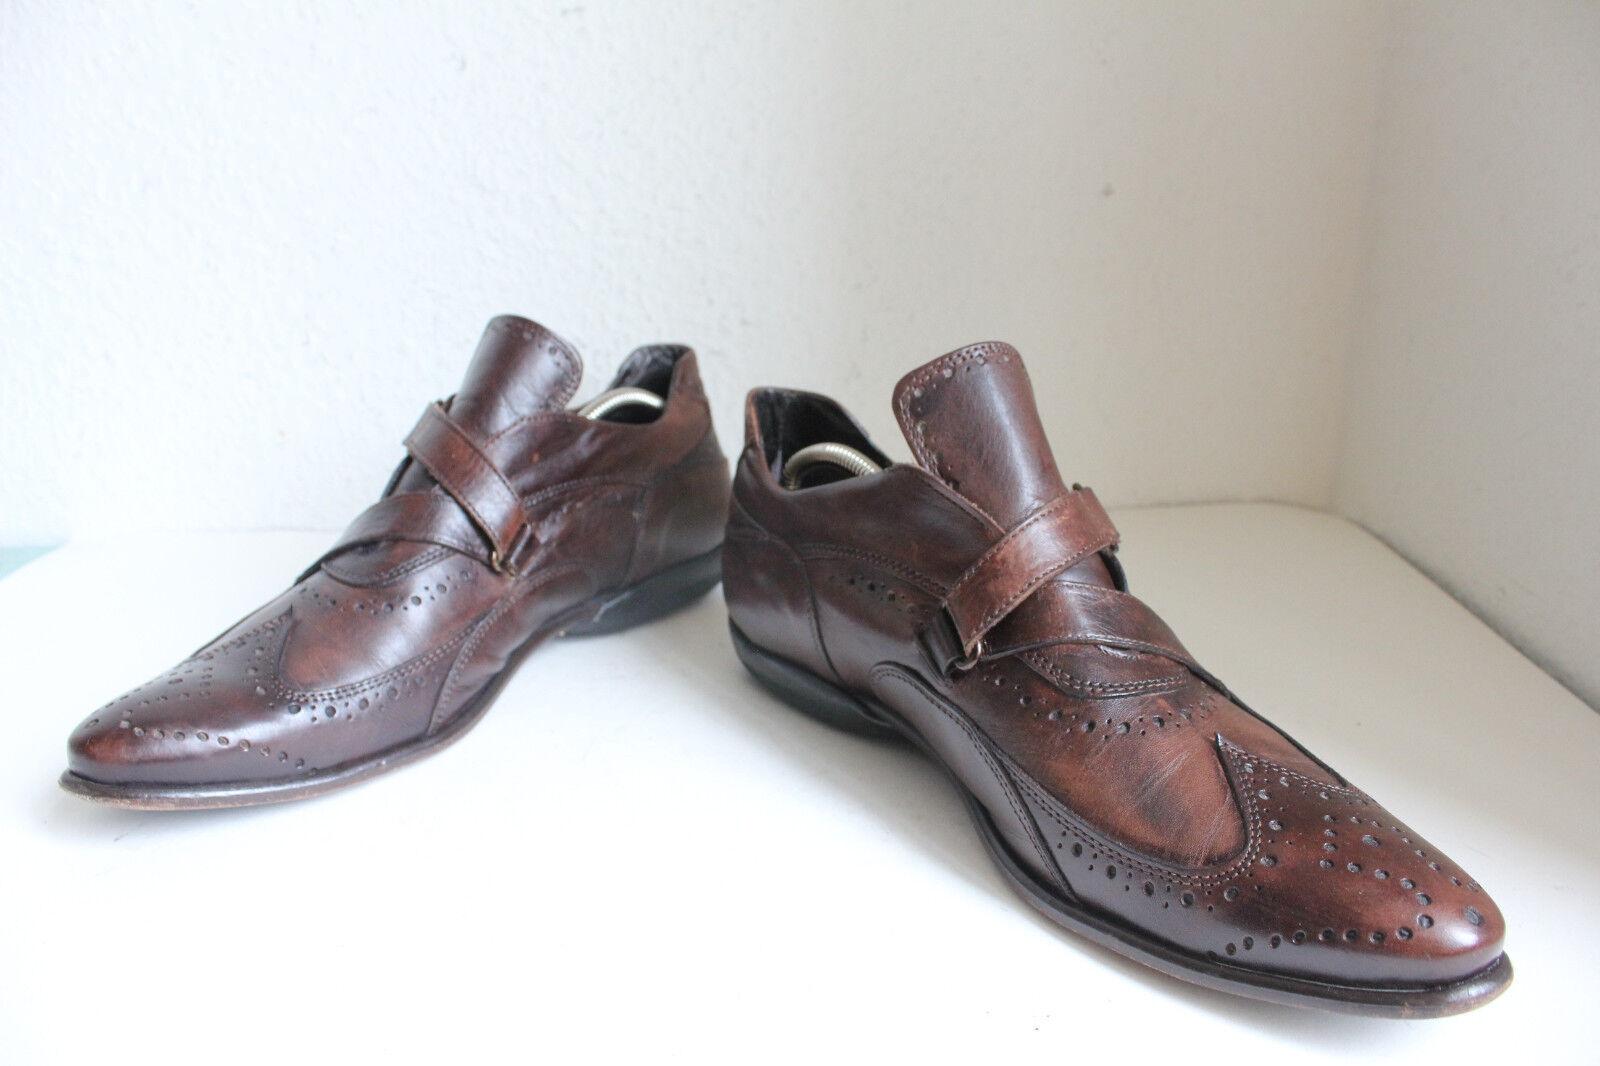 Elegante Voll Budapester Halb Stiefeletten botas Voll Elegante Echtleder Braun Eu:45-45,5 bc5379